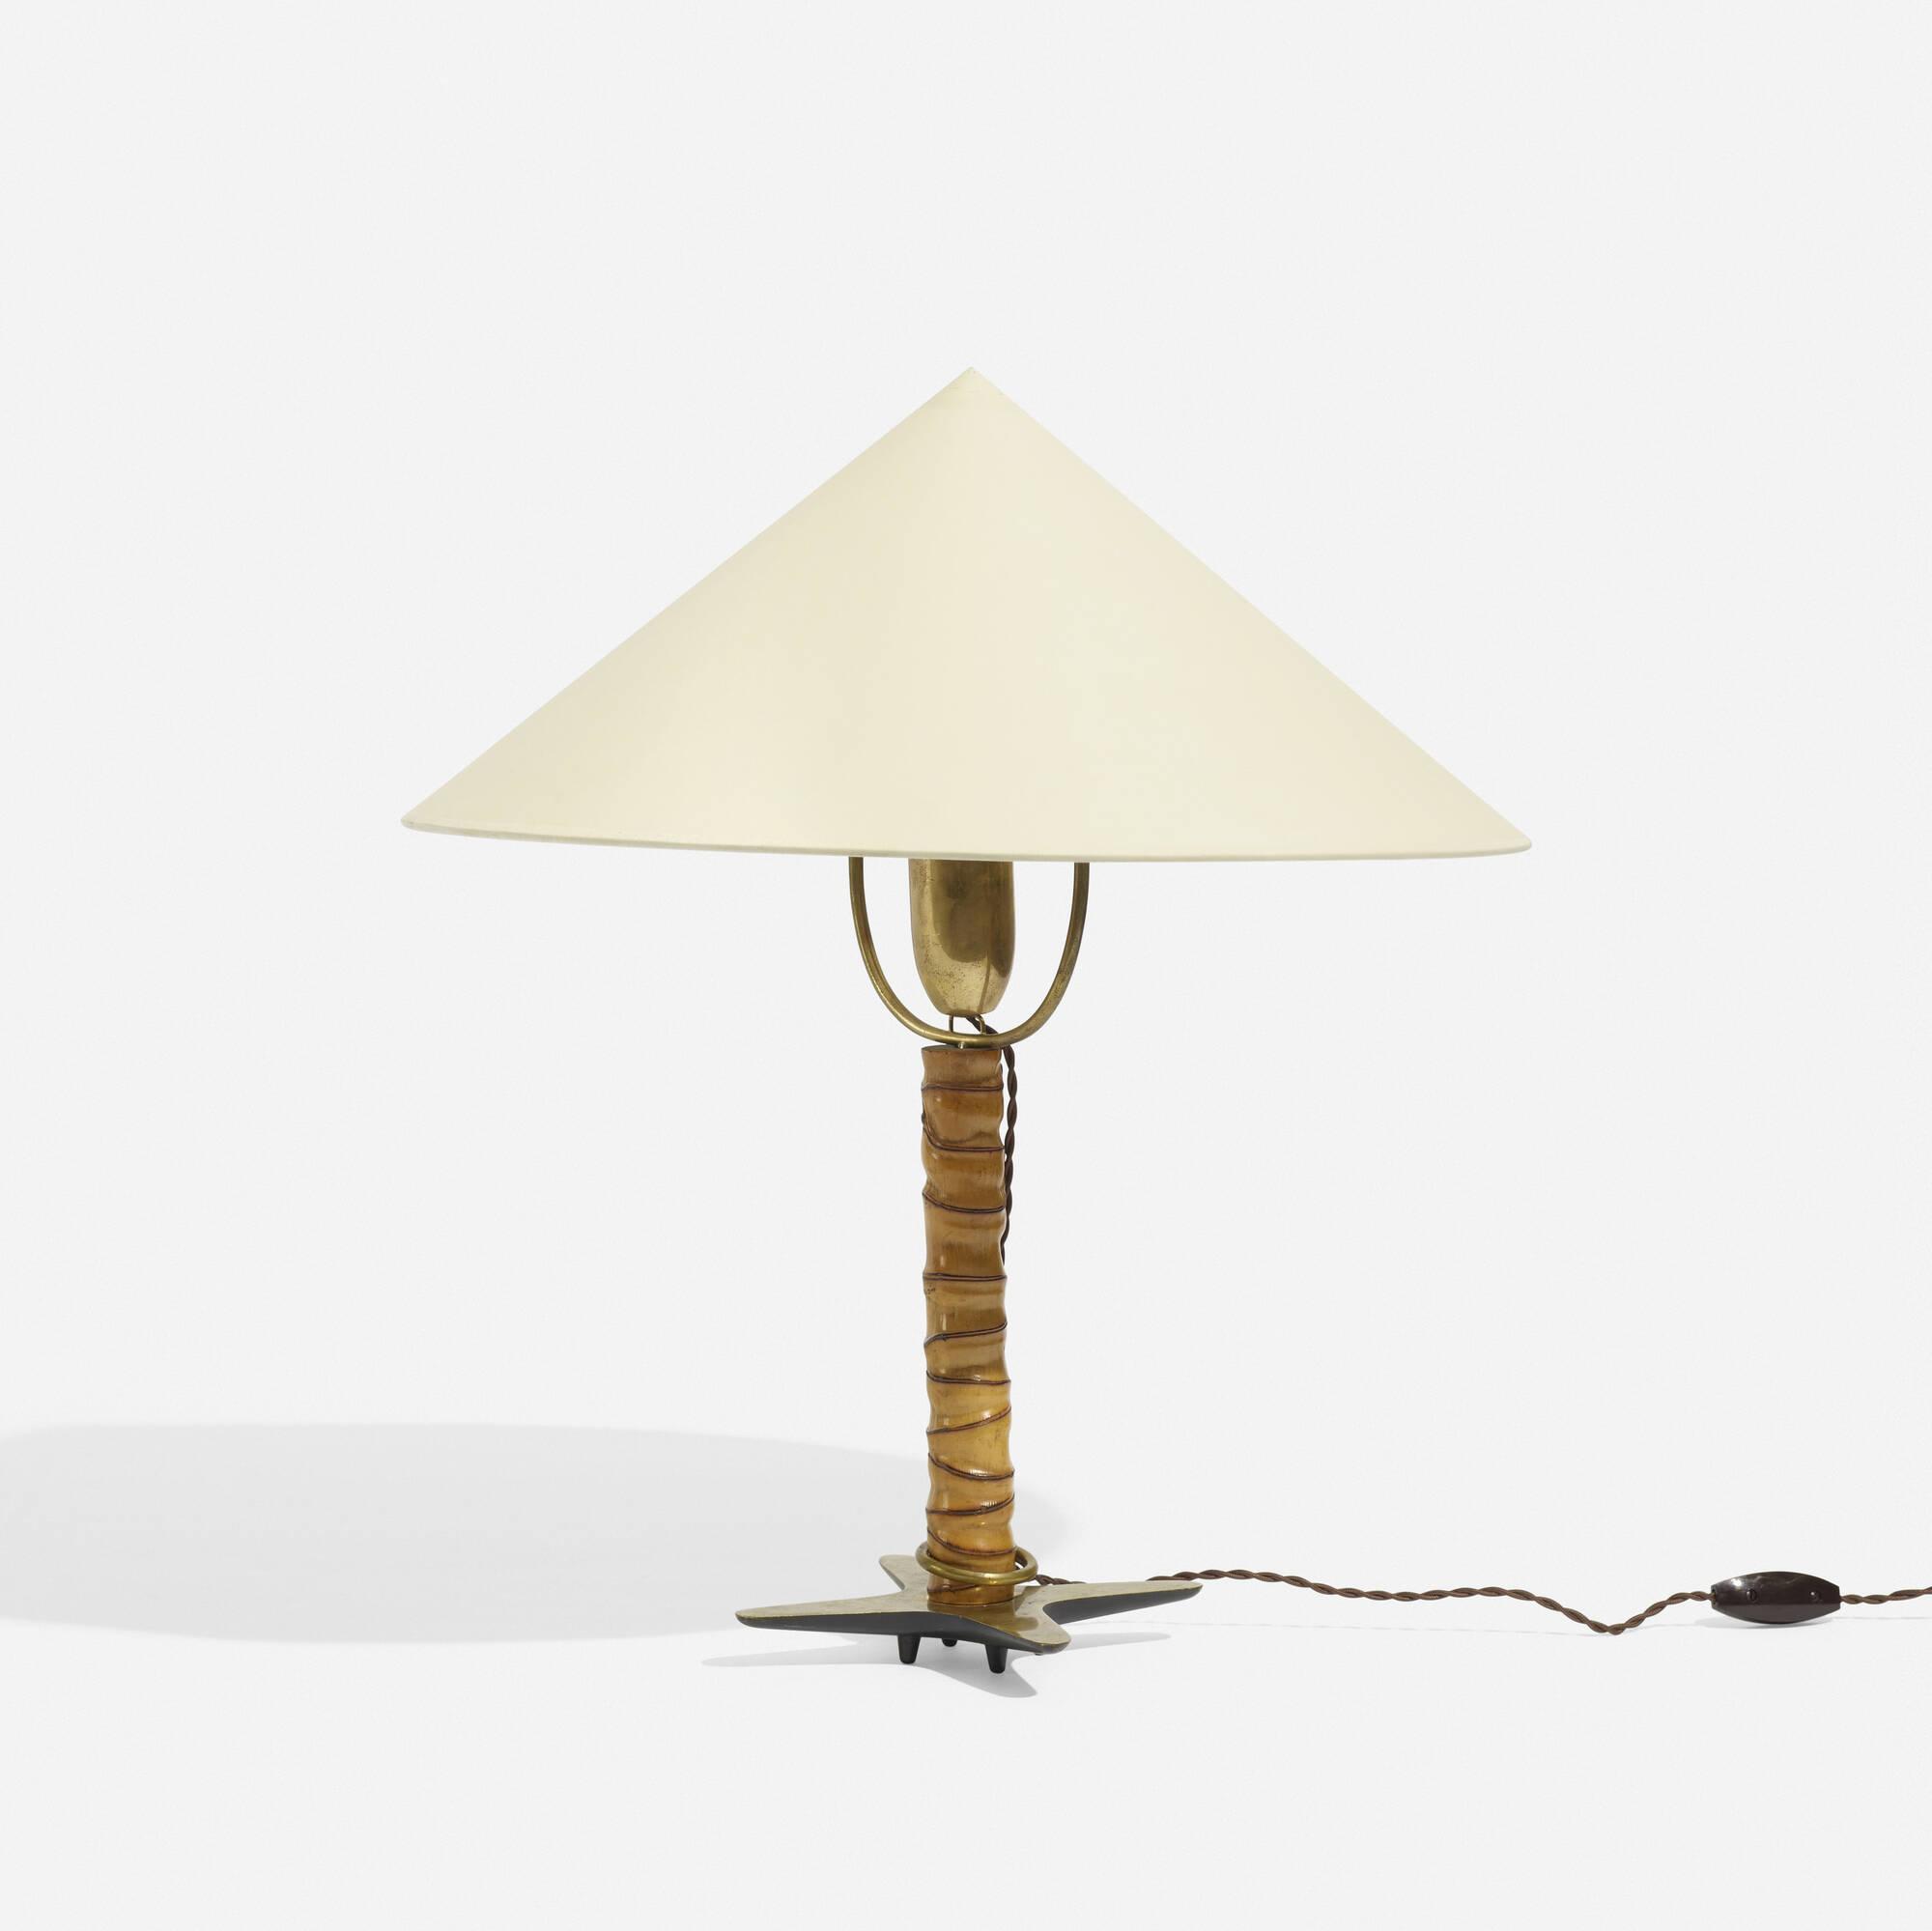 140: Carl Auböck II / table lamp (2 of 3)